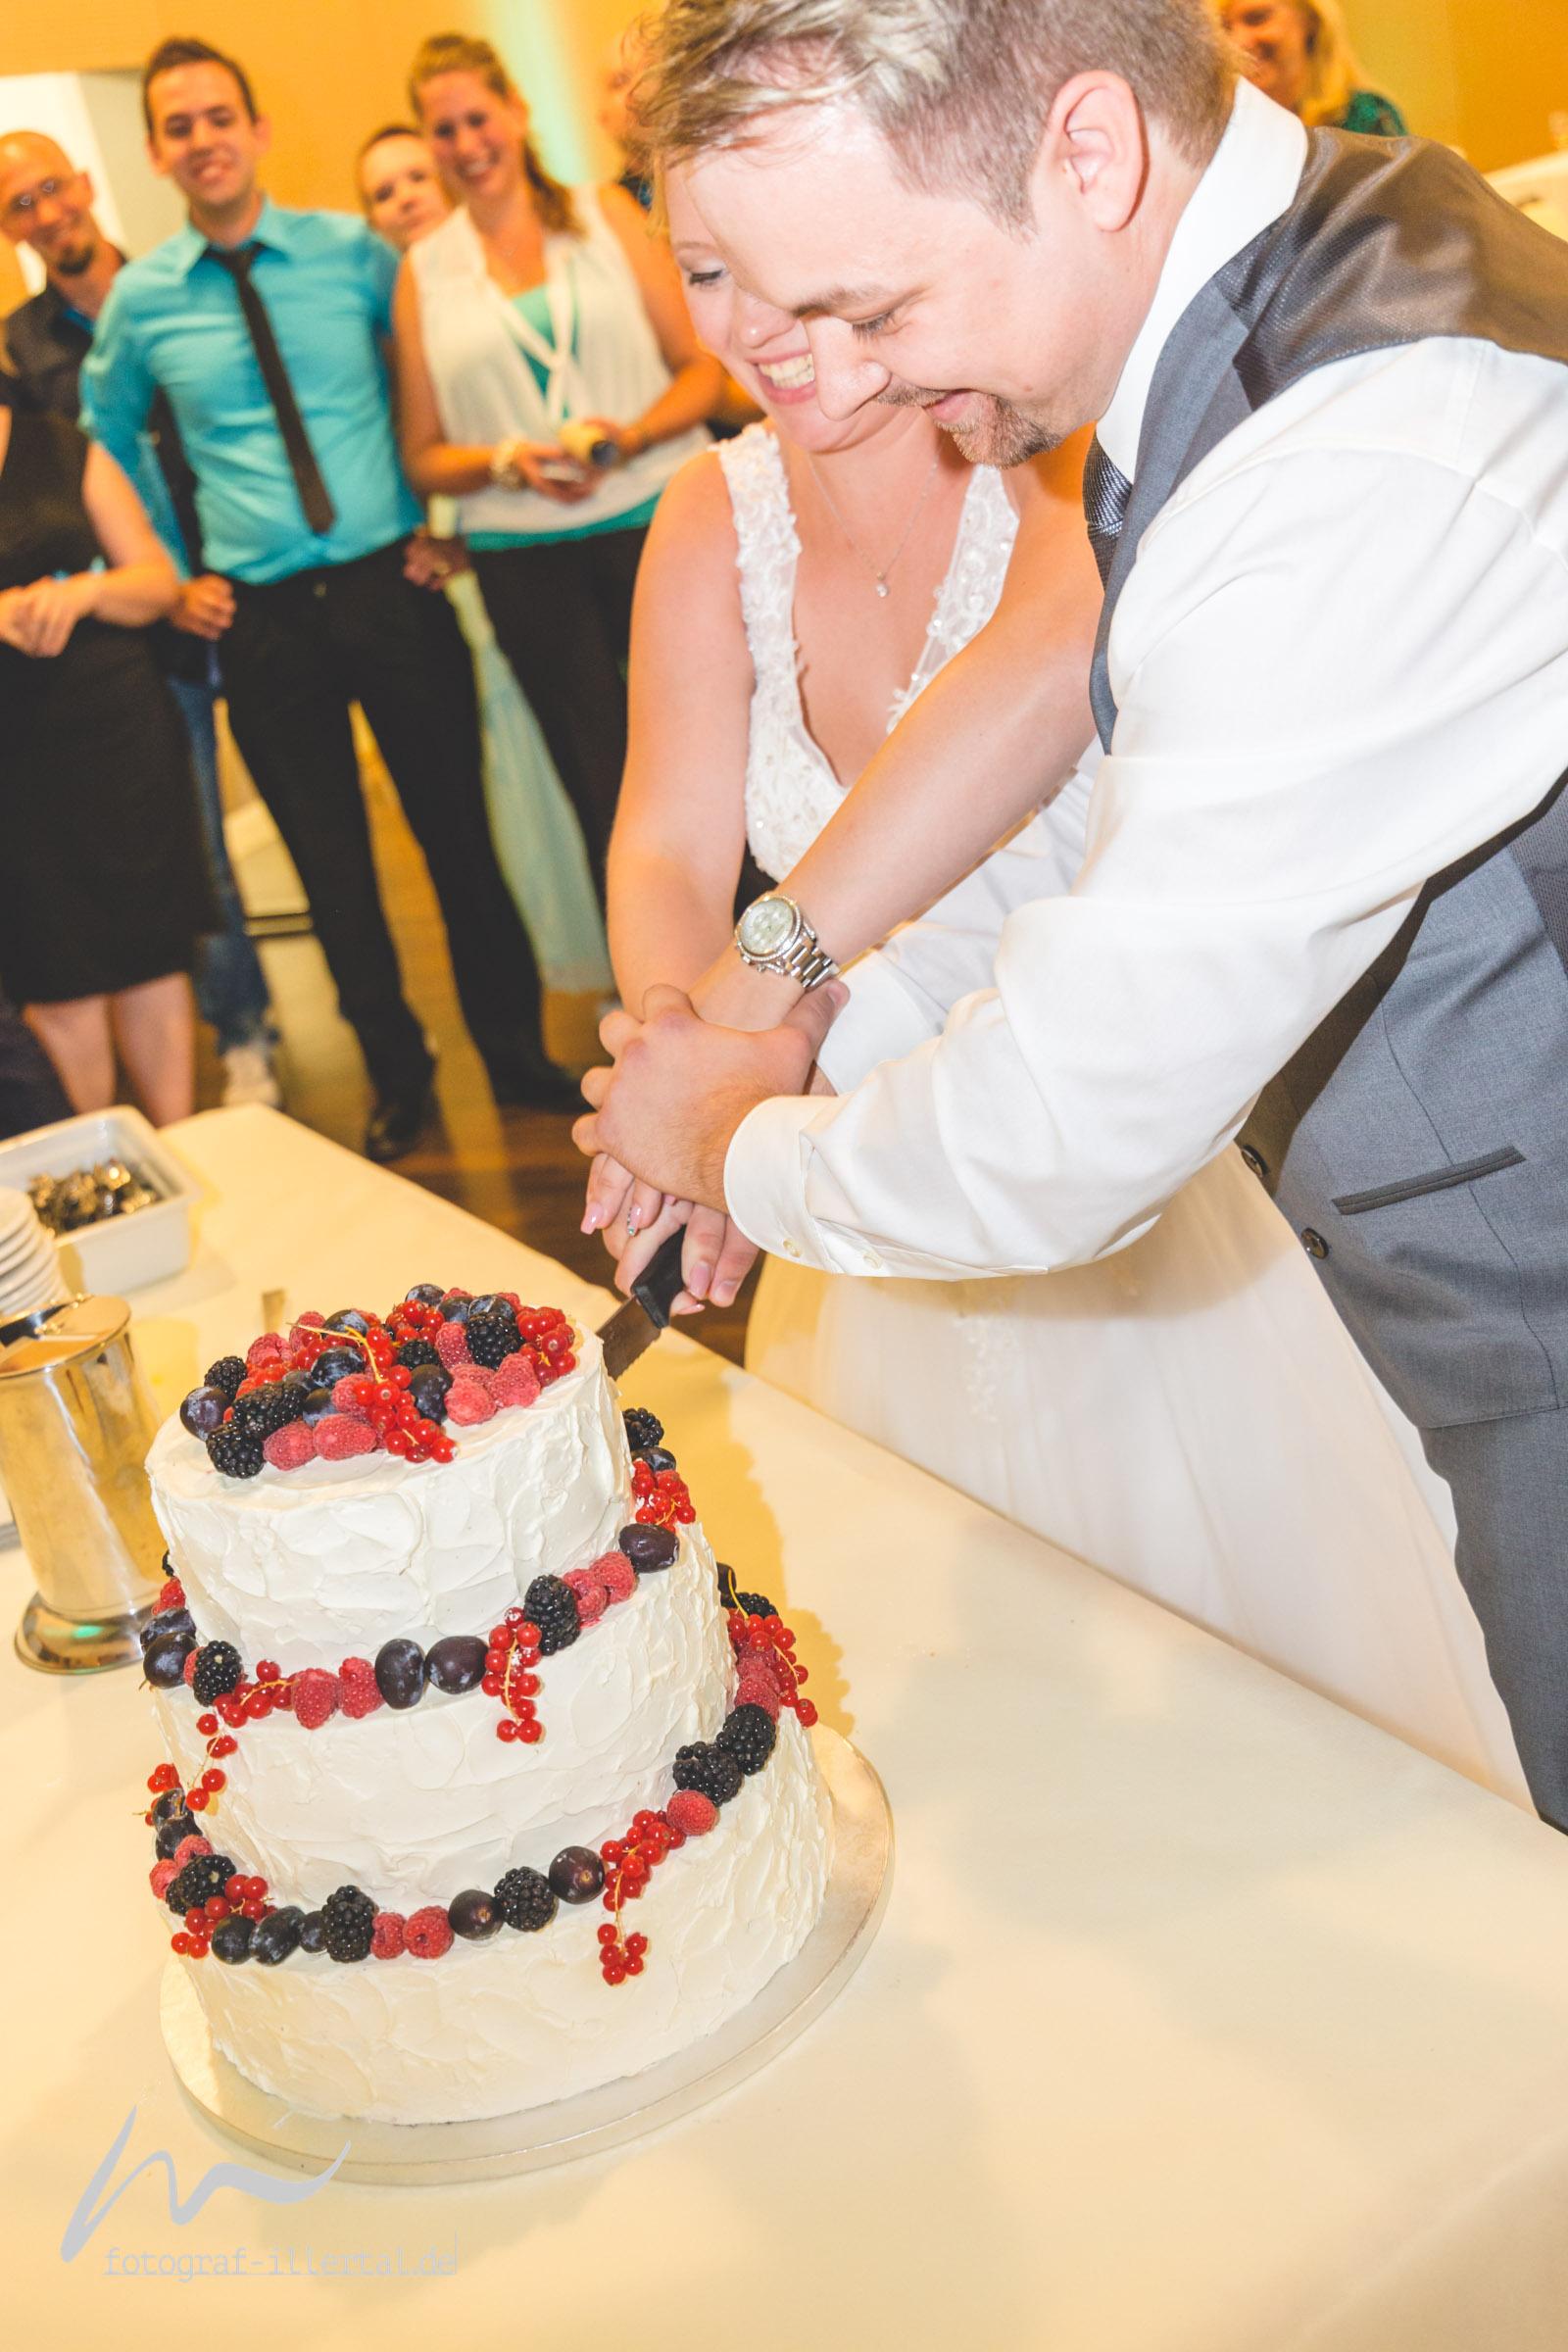 Fotograf Illertal-Christian Miller-Hochzeitsfotografie-_MG_6995